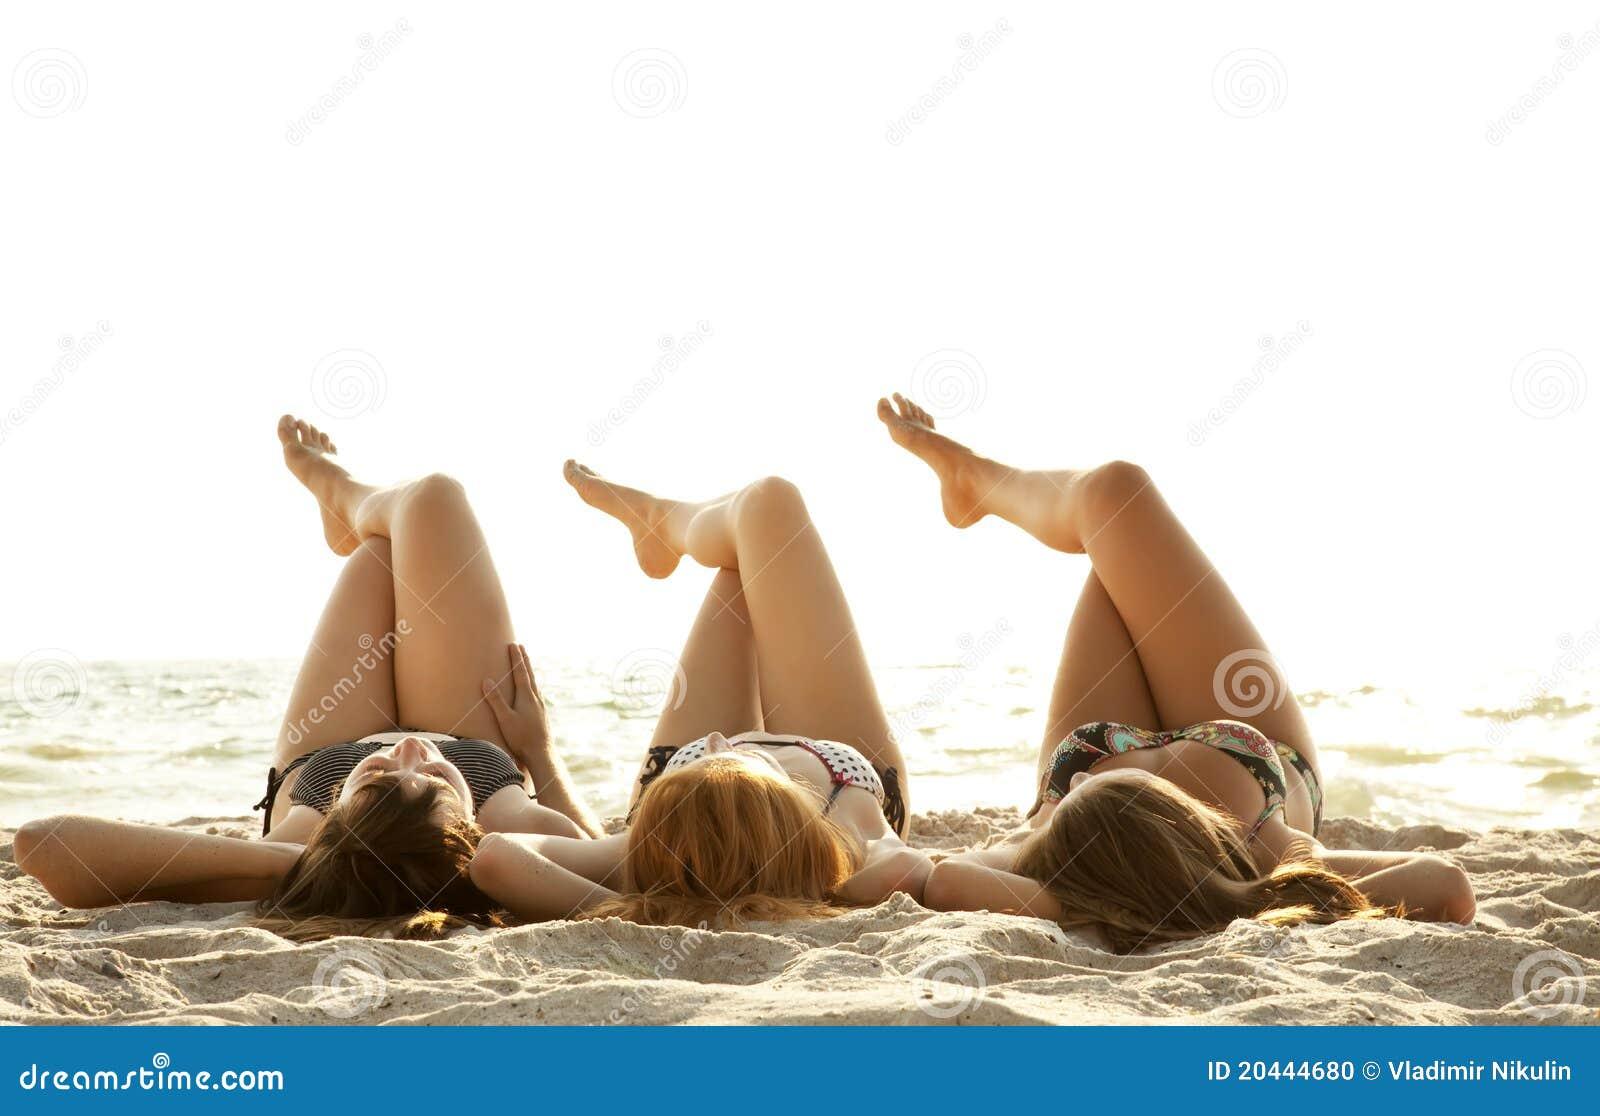 Novias en bikiní en la playa